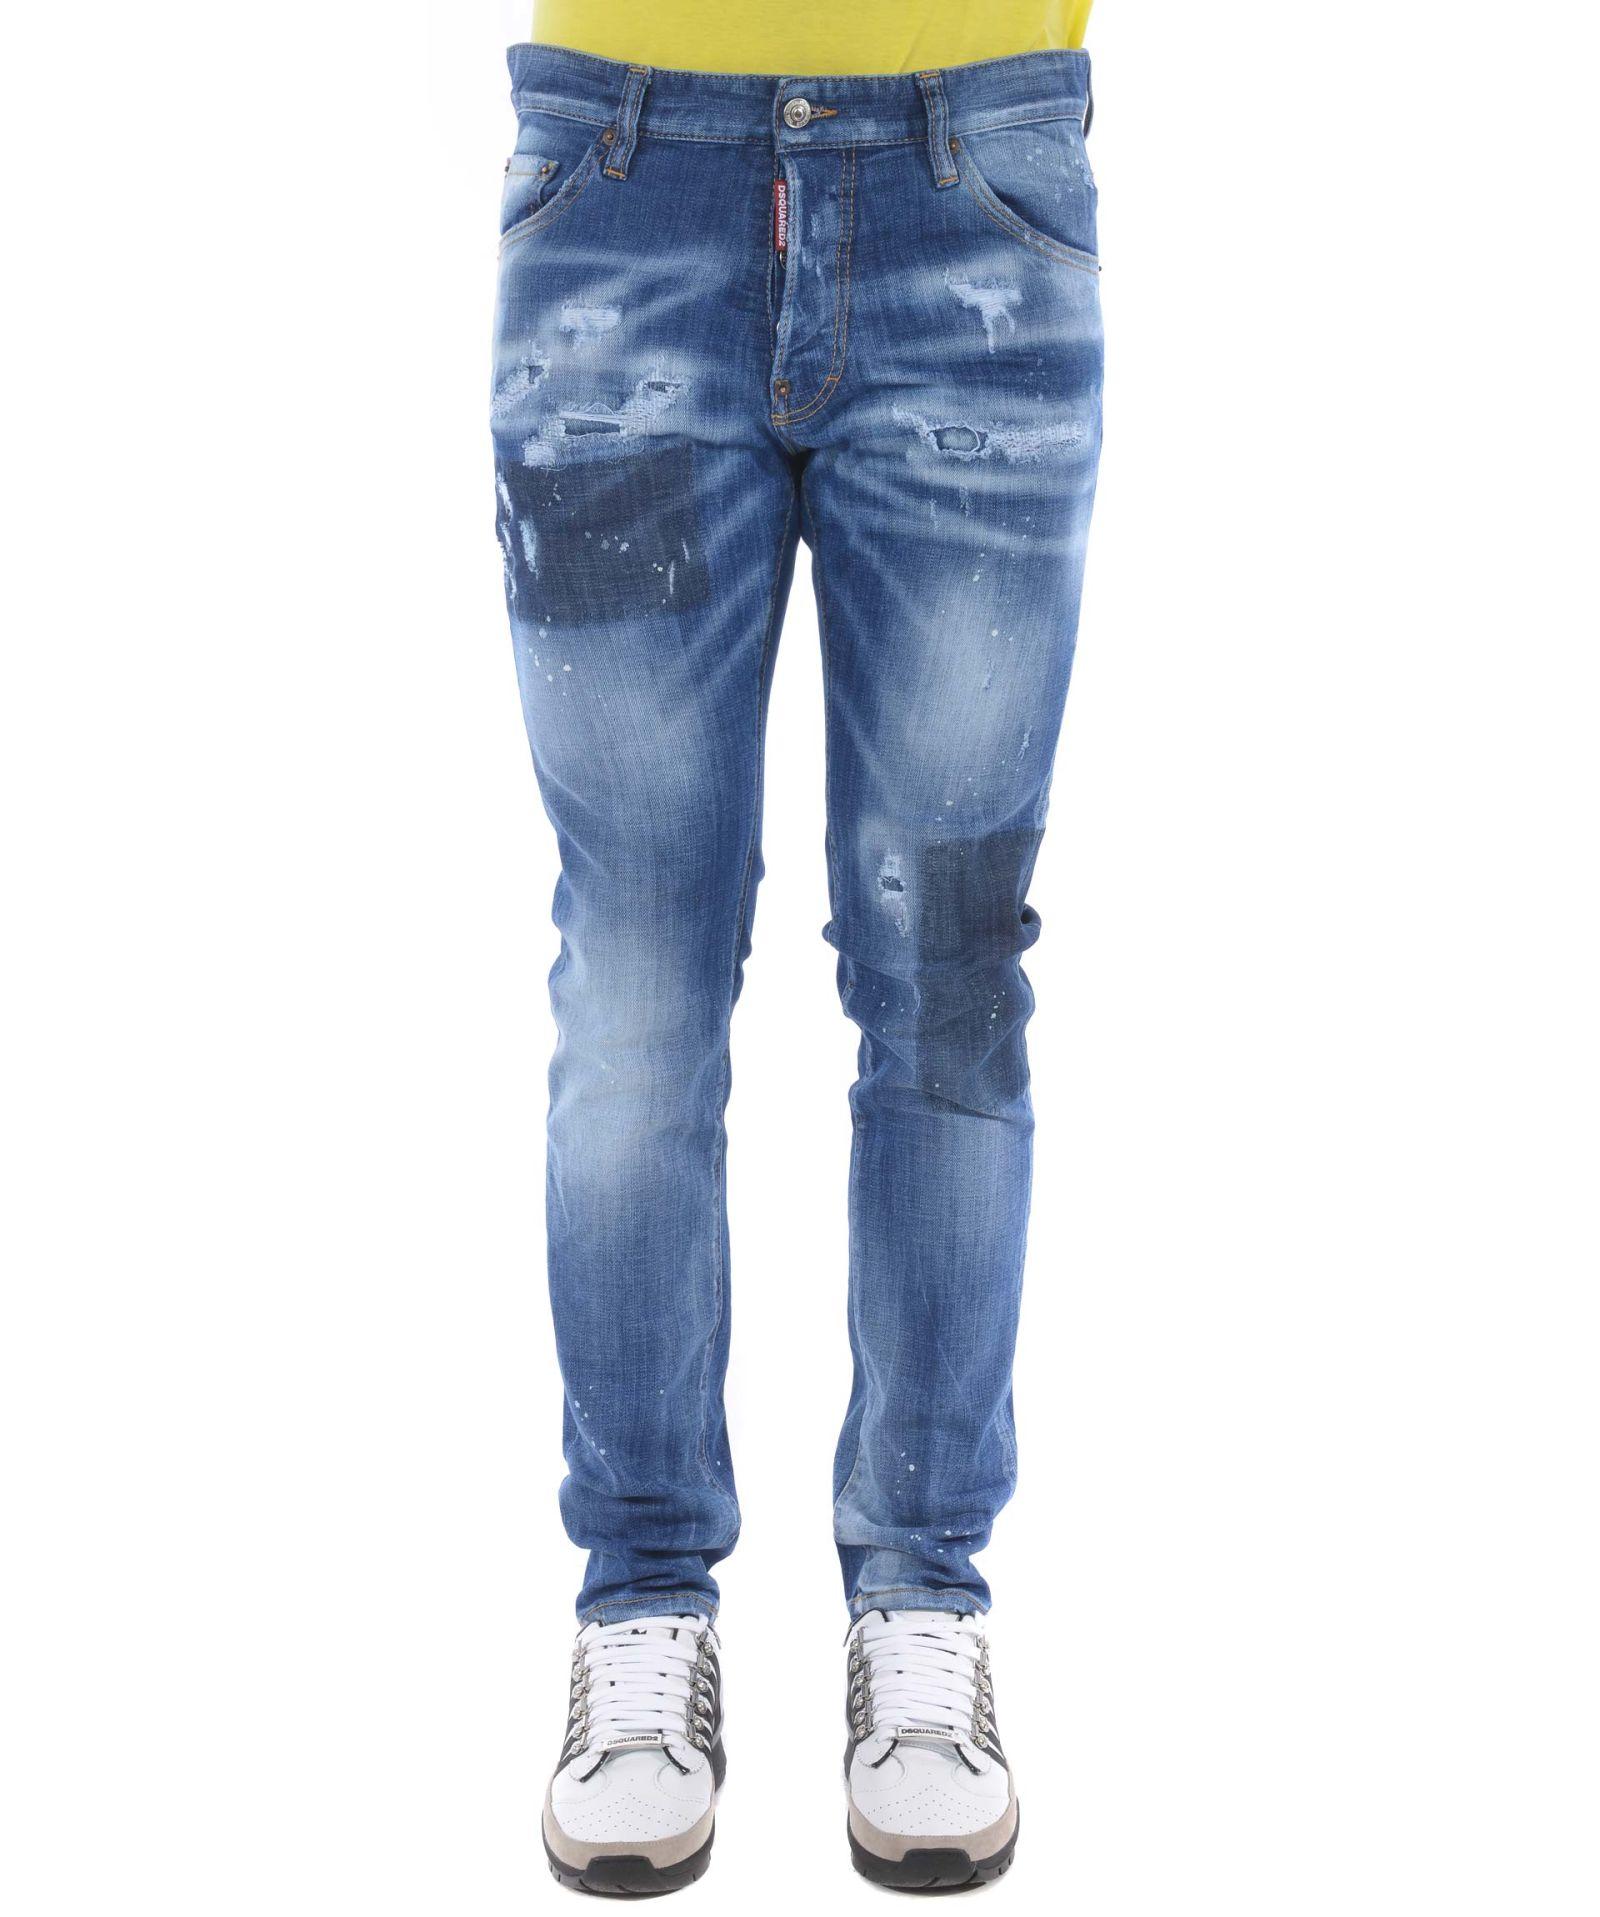 67b46af8a7 Dsquared2 Dsquared2 Cool Guy Distressed Jeans - Denim - 10863308 ...